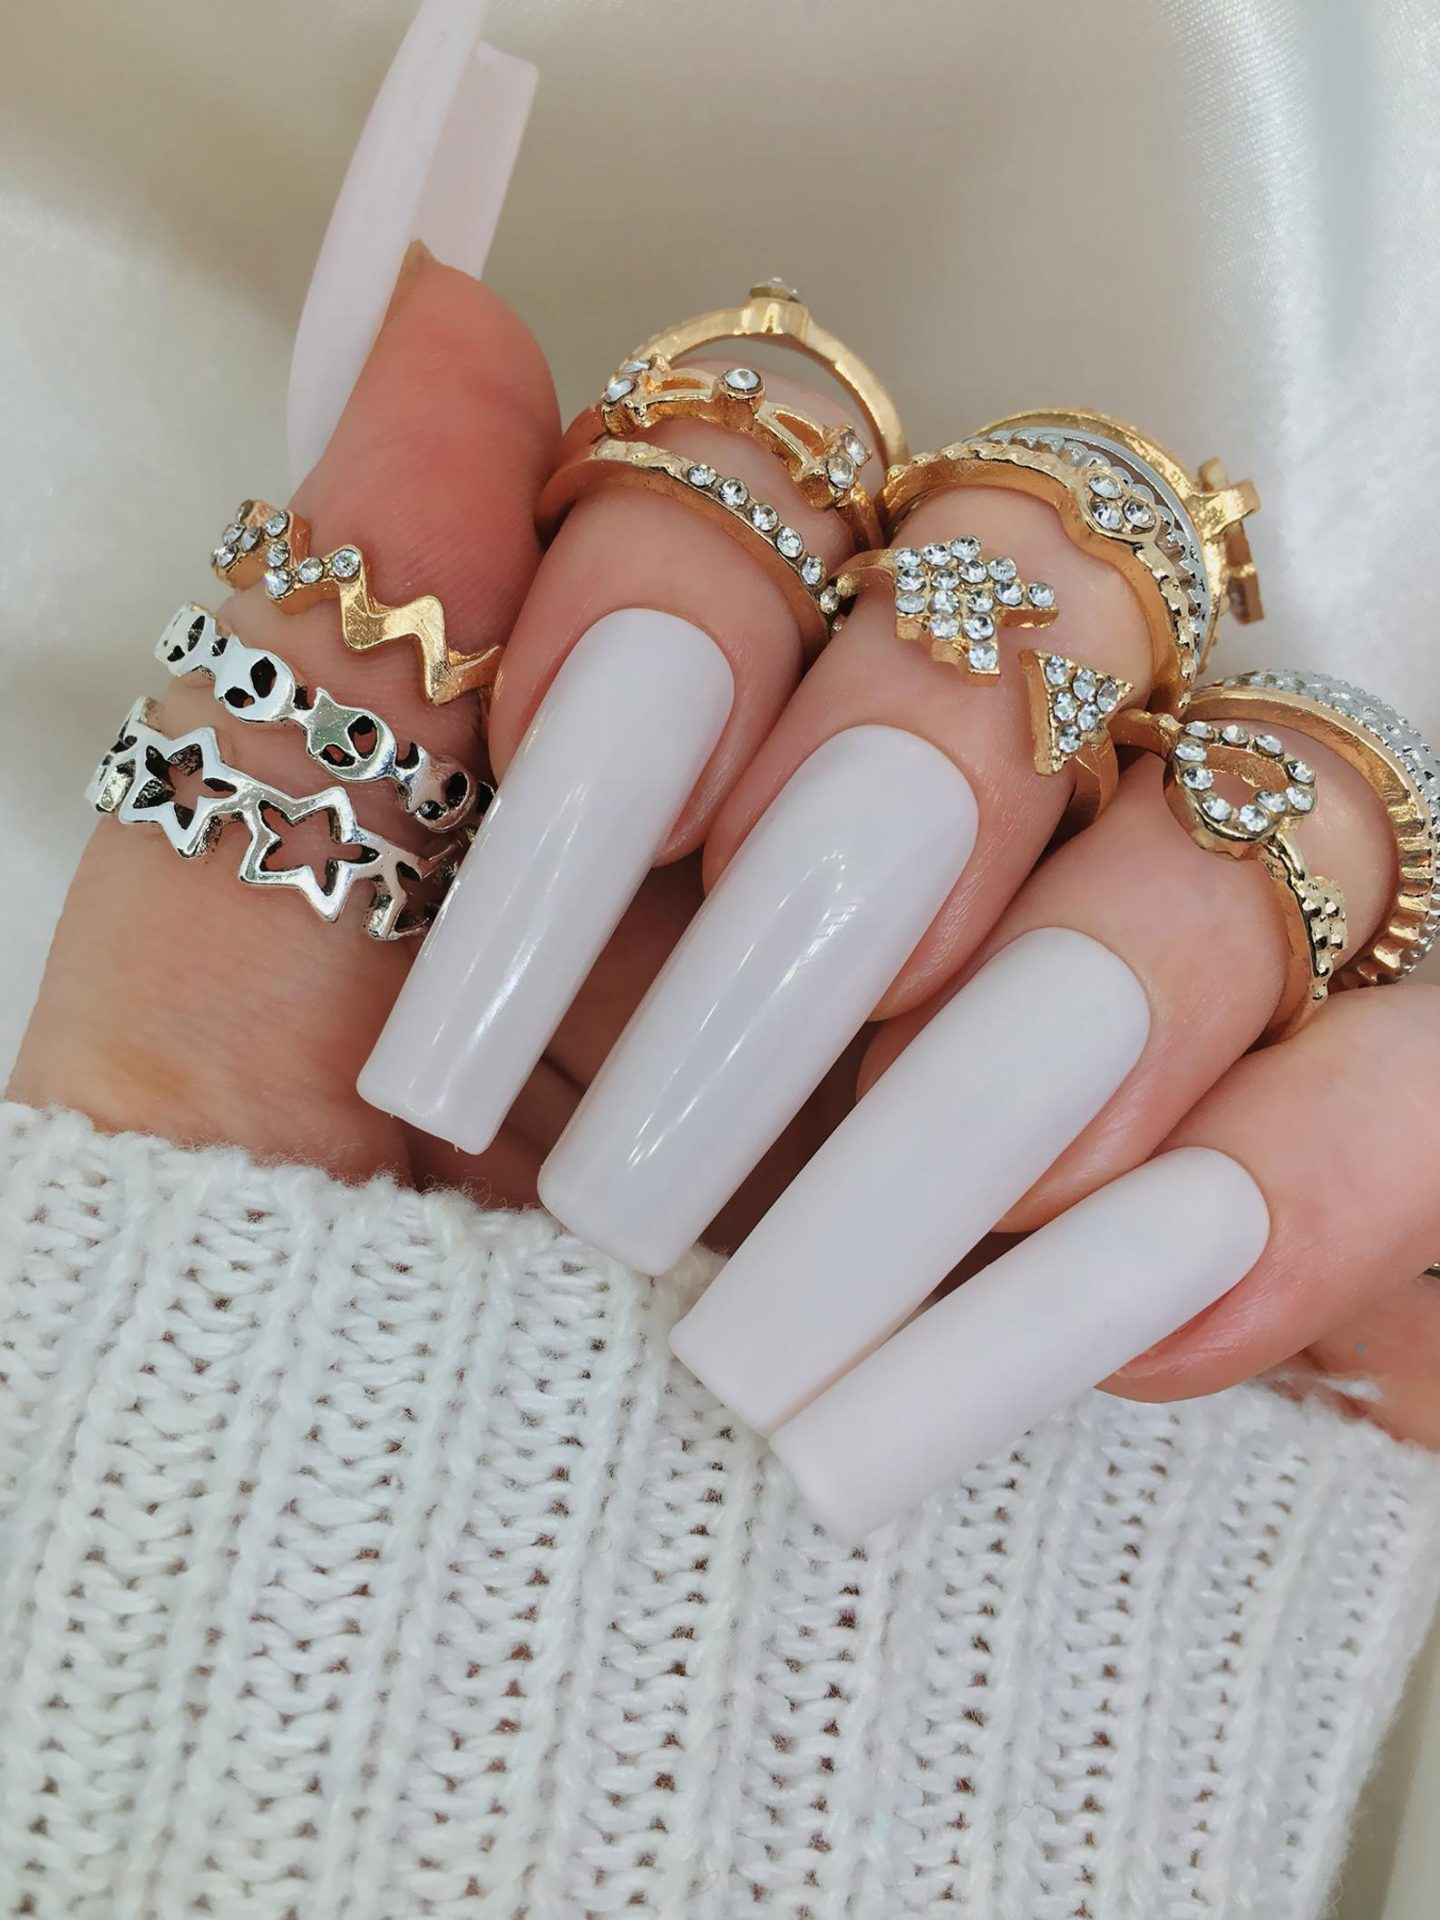 Long cream coffin nails